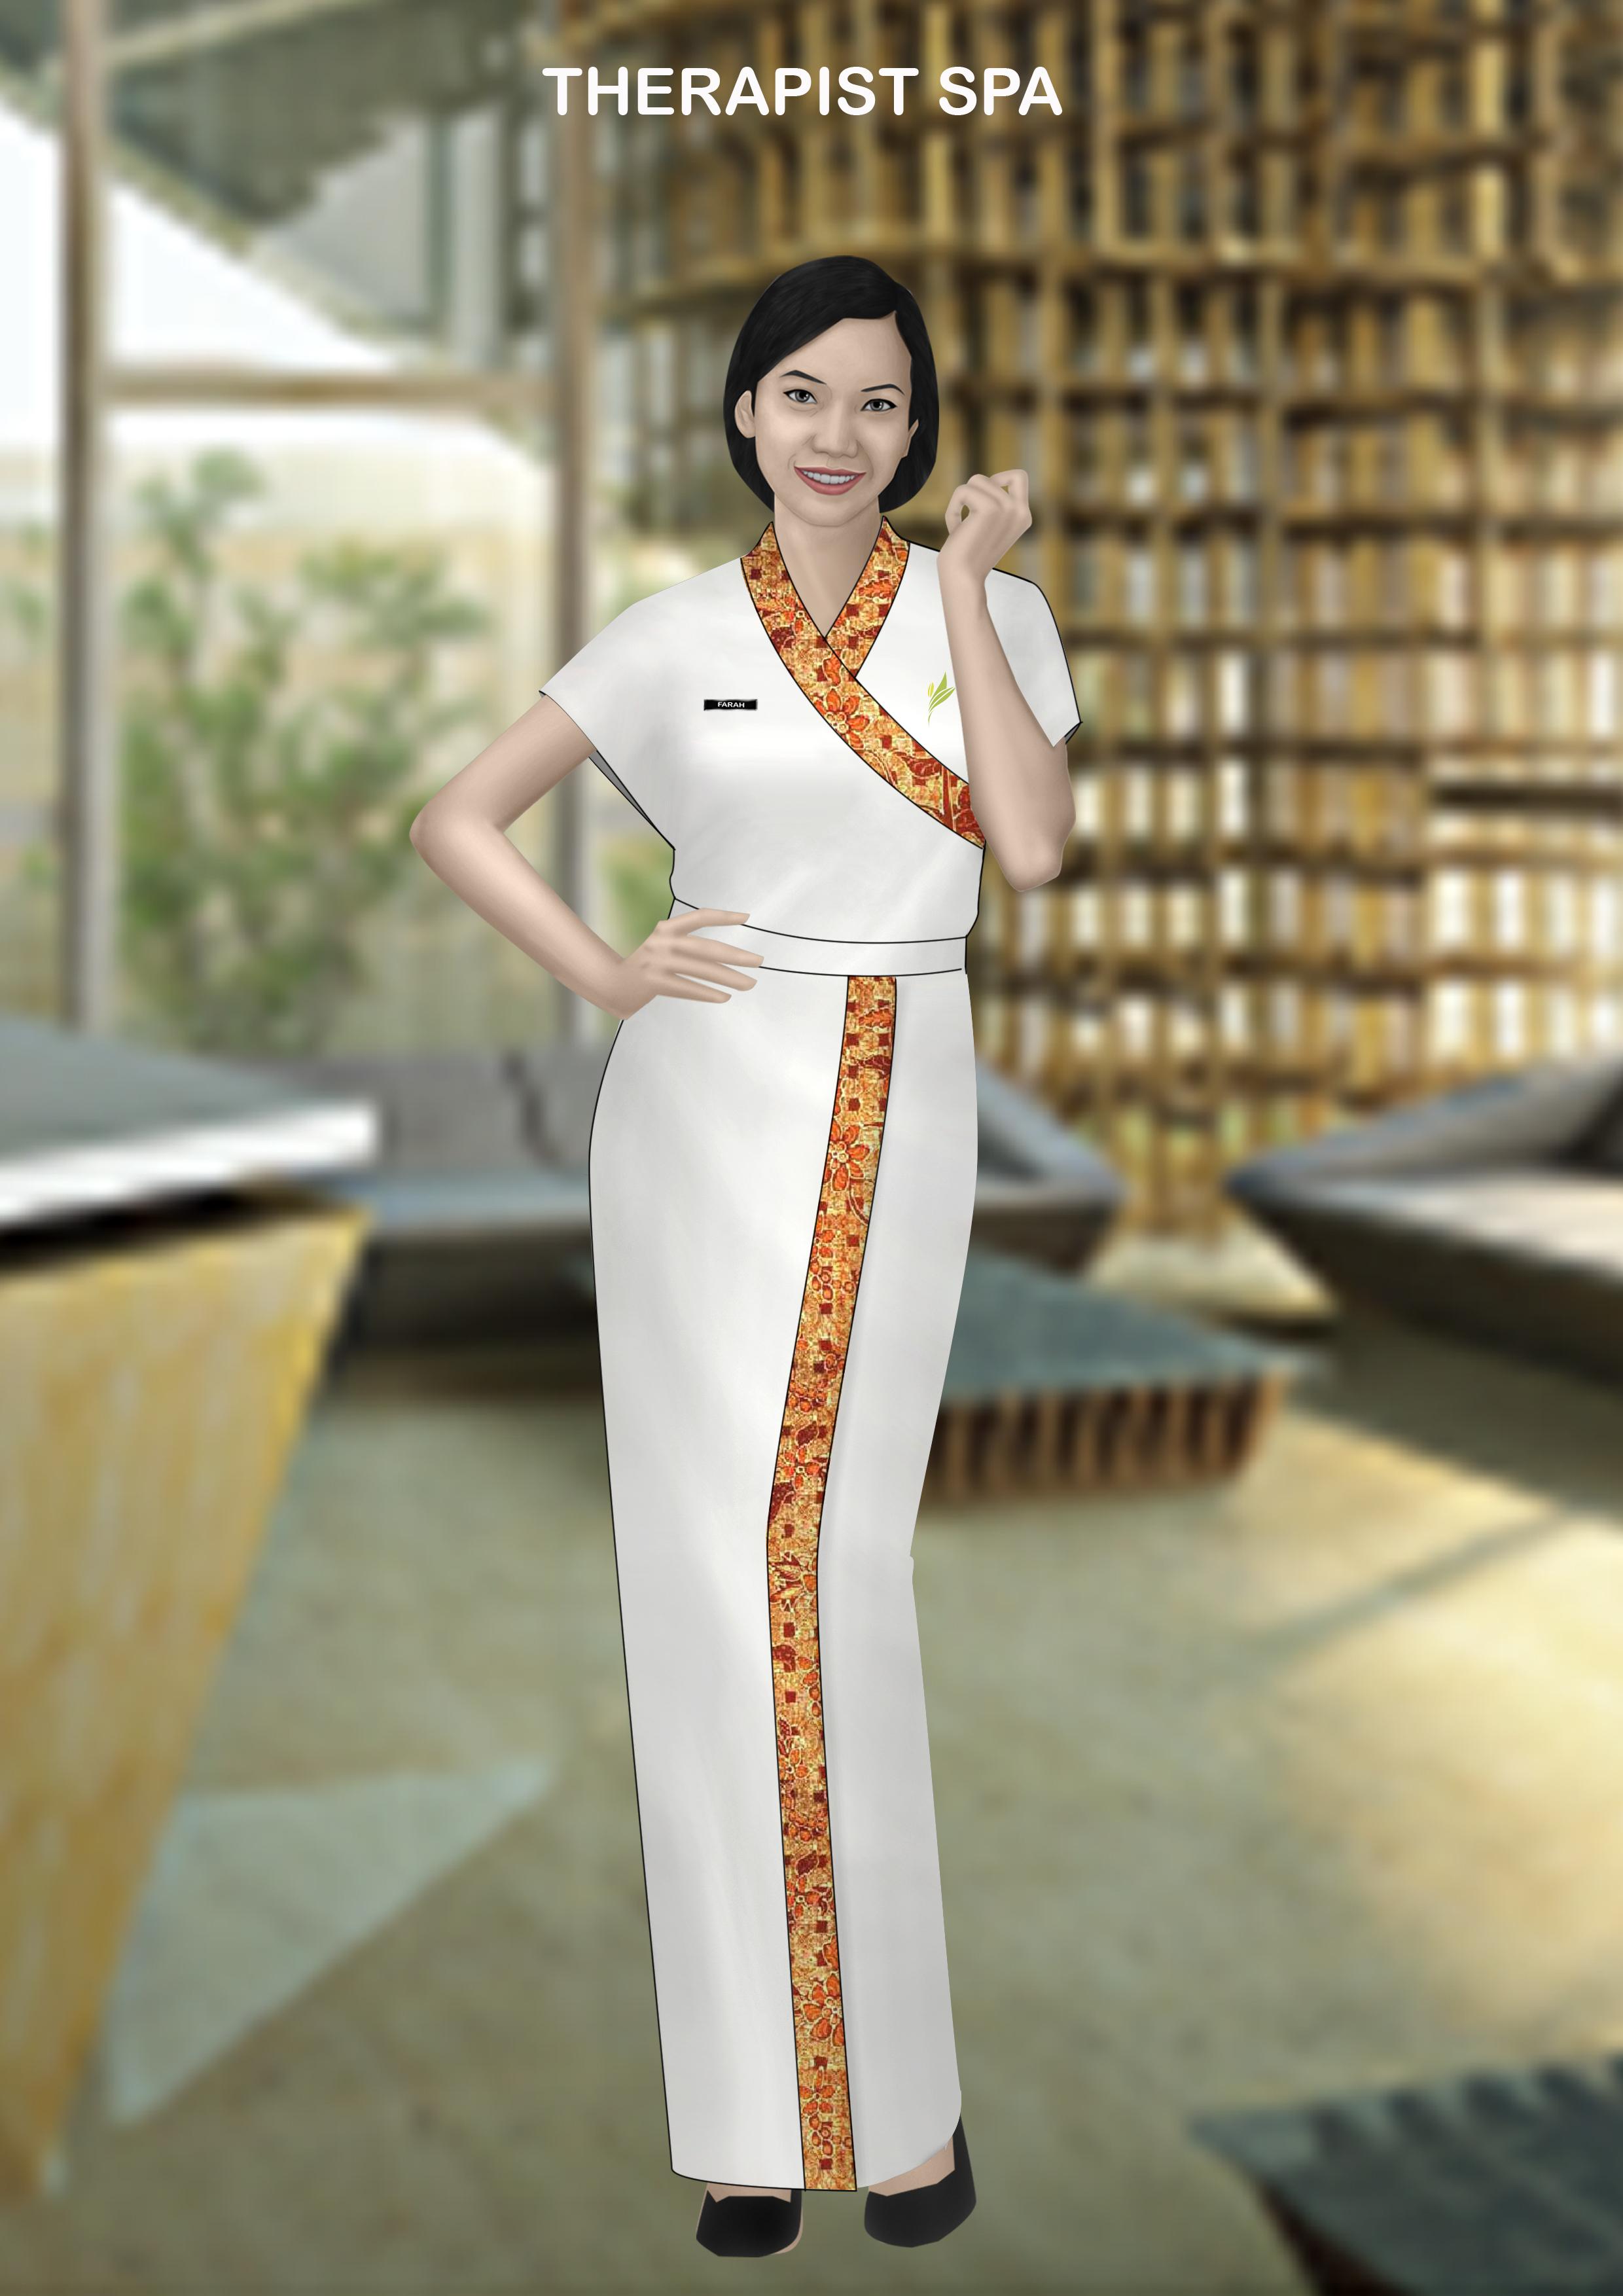 Seragam hotel malino highlands for Spa uniform indonesia